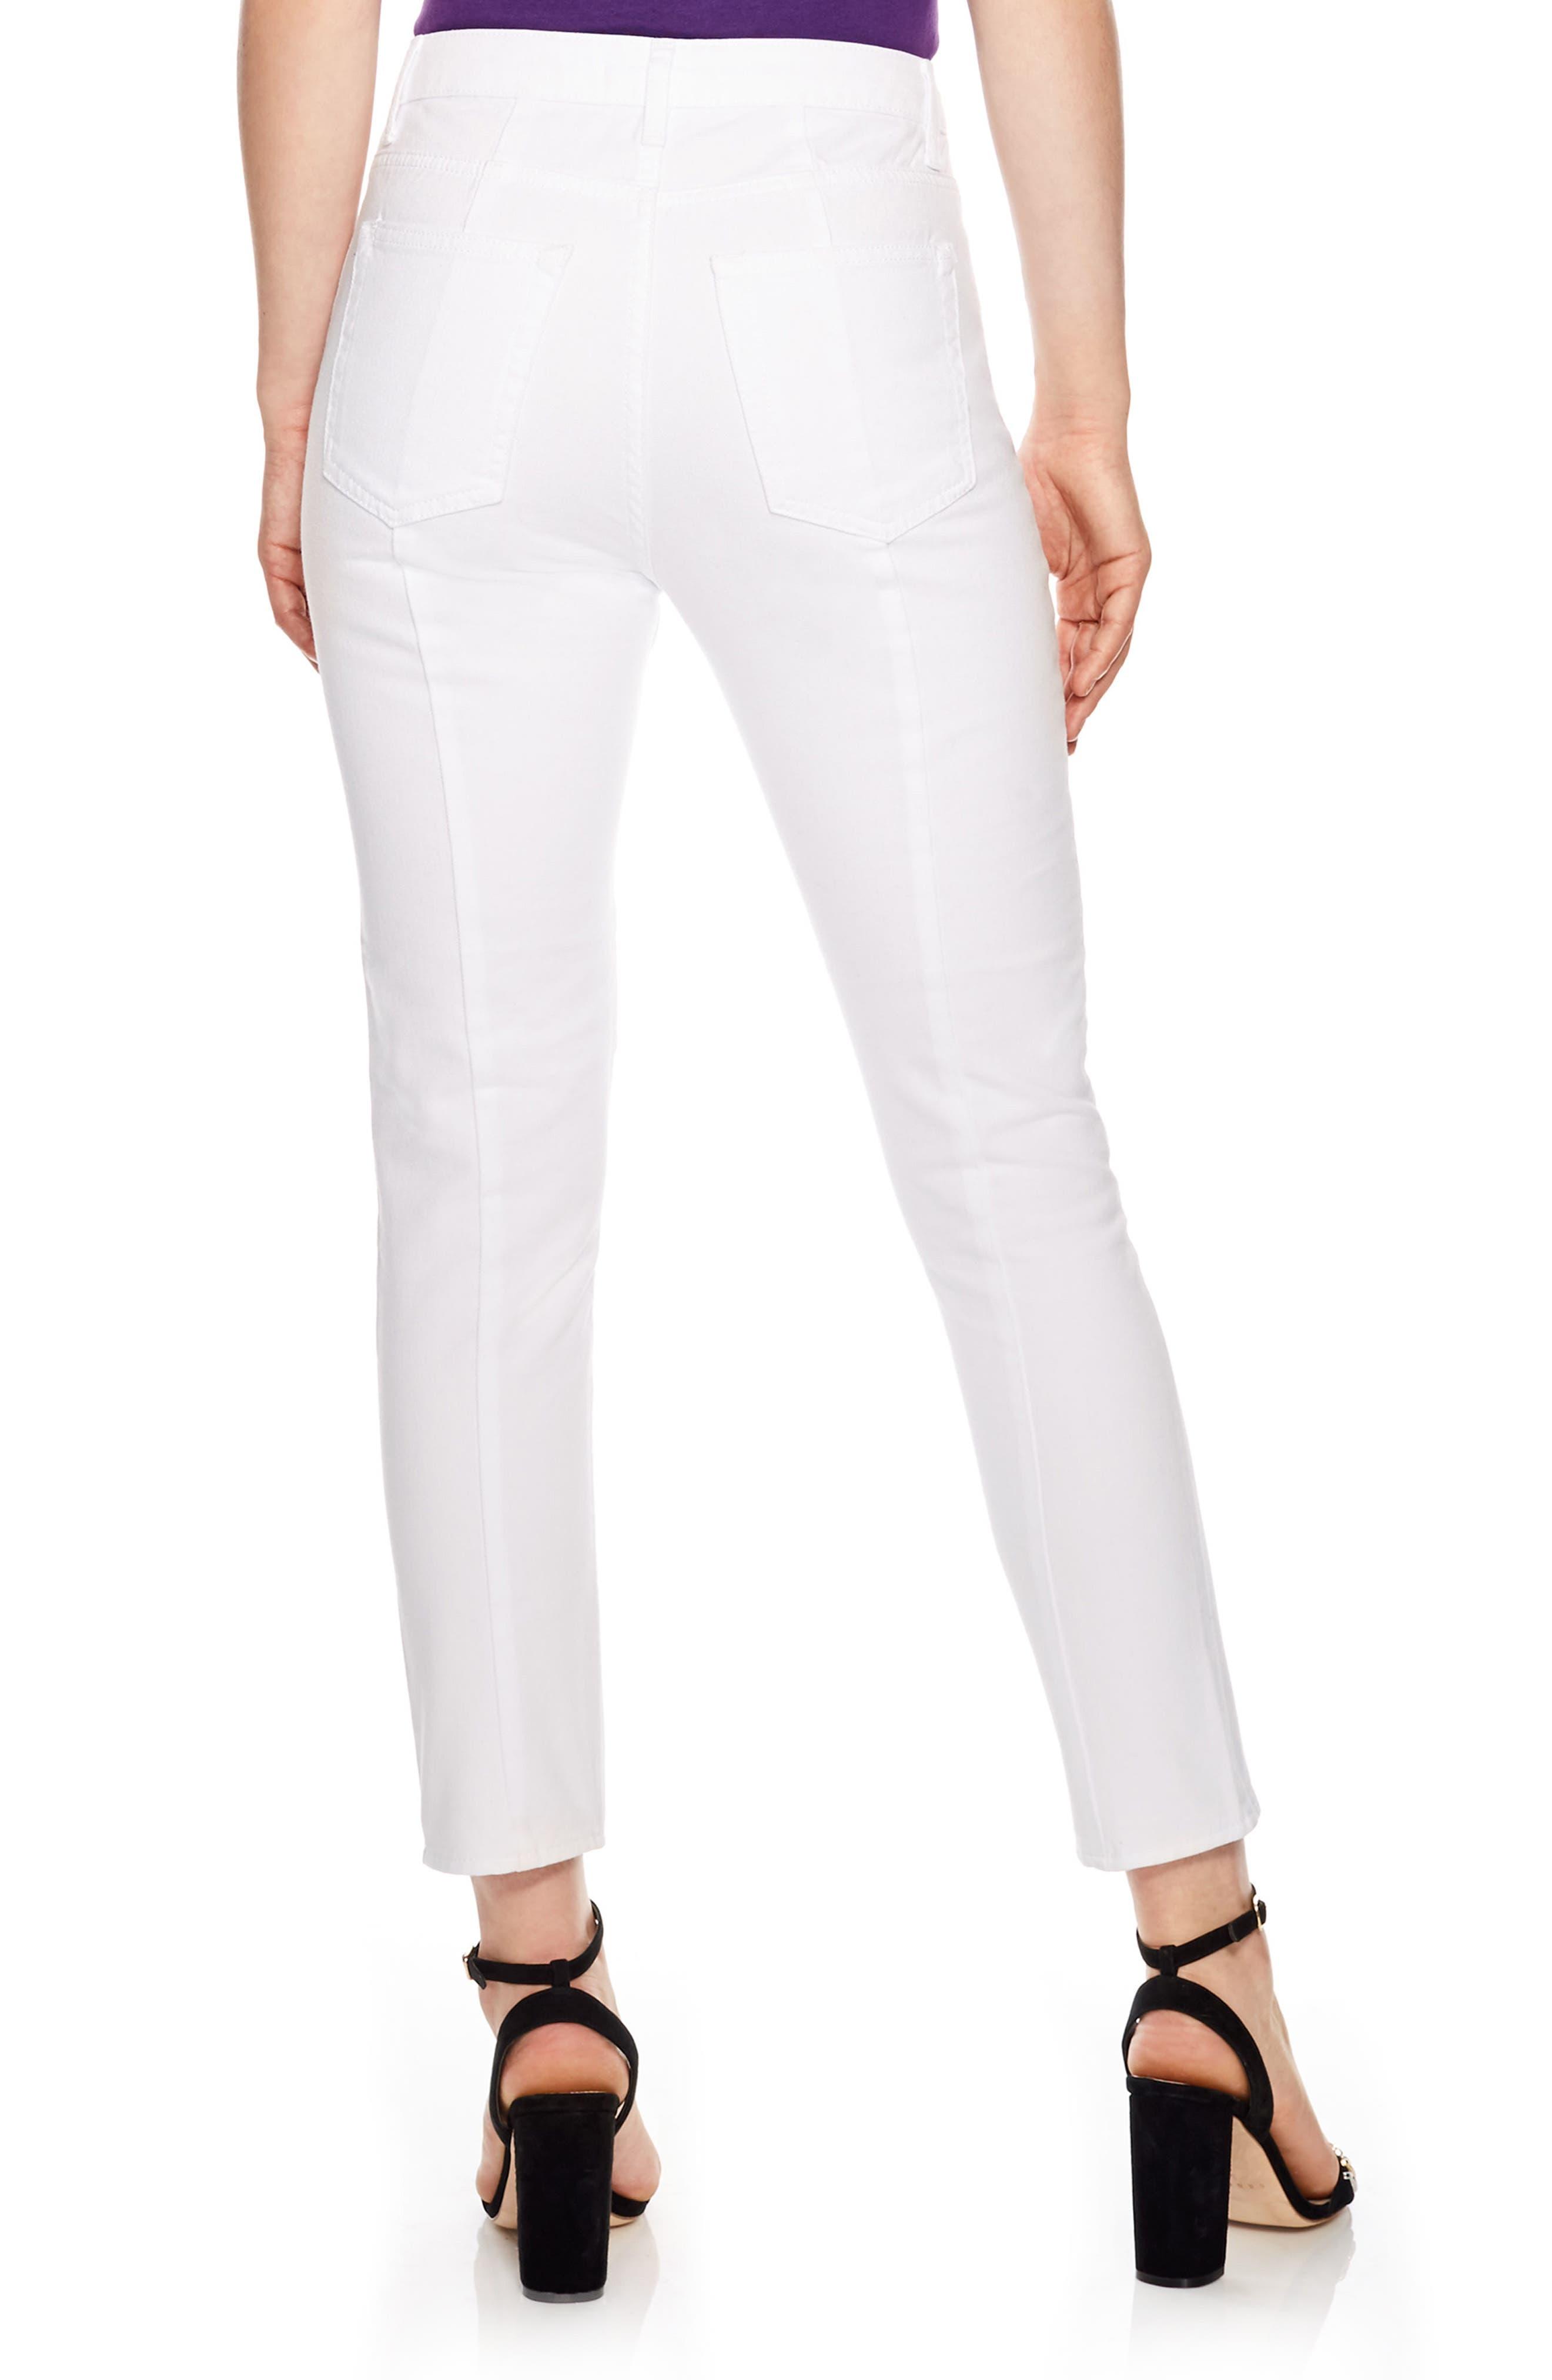 Blanc White Zip Jeans,                             Alternate thumbnail 2, color,                             White